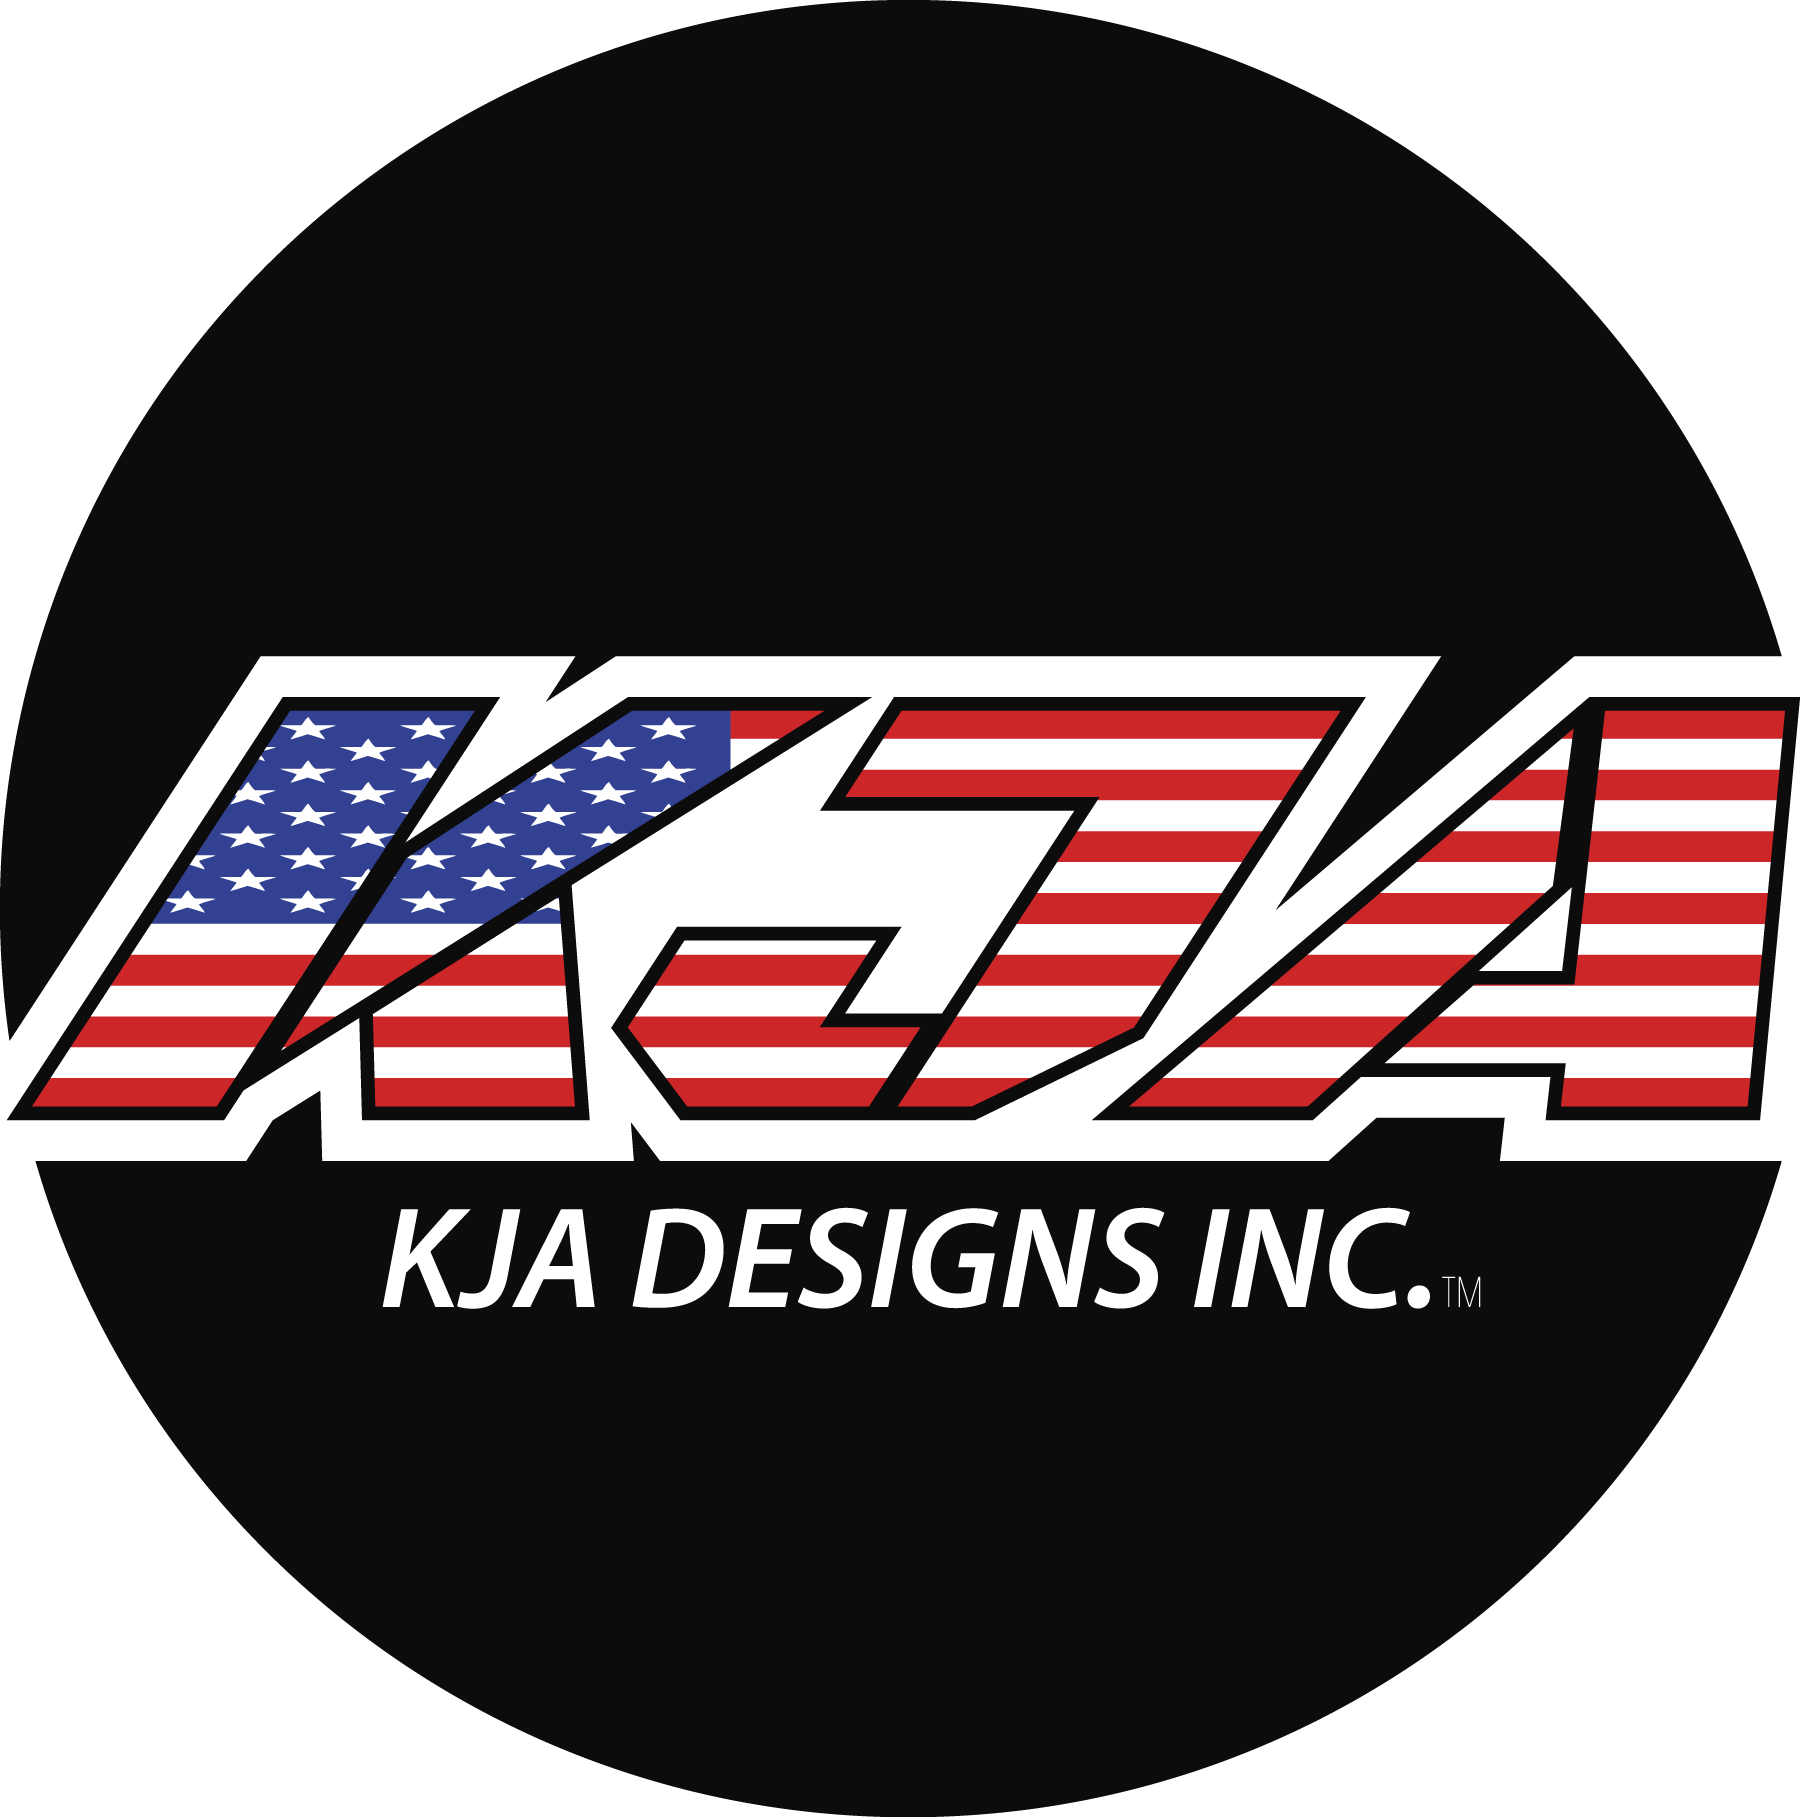 KJA Designs Inc.™ 1C